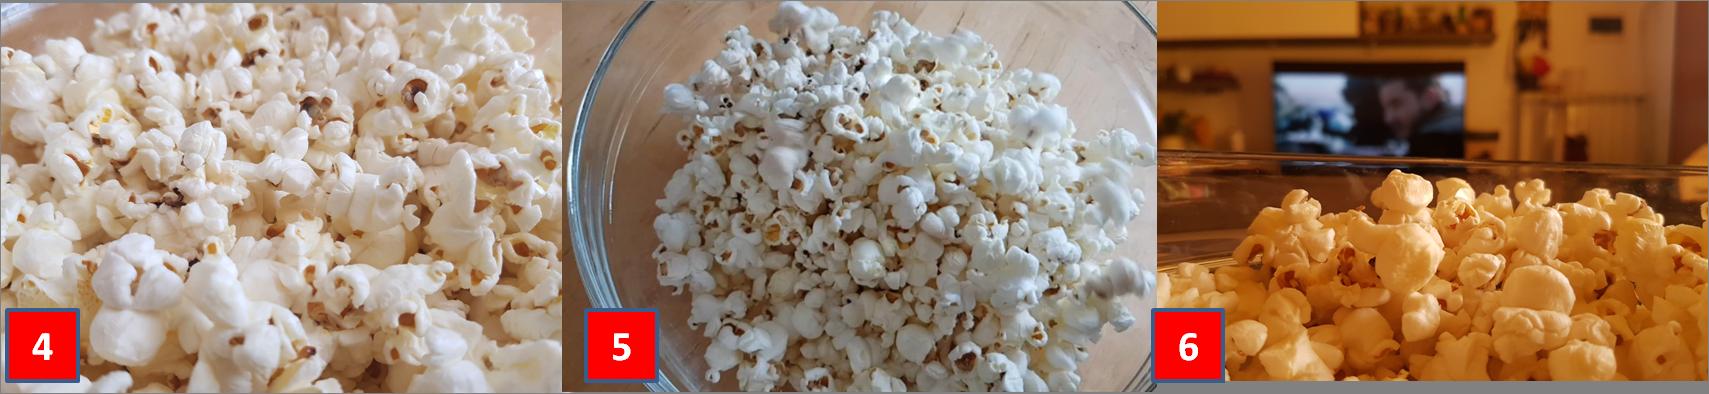 ricetta passo passa popcorn 2